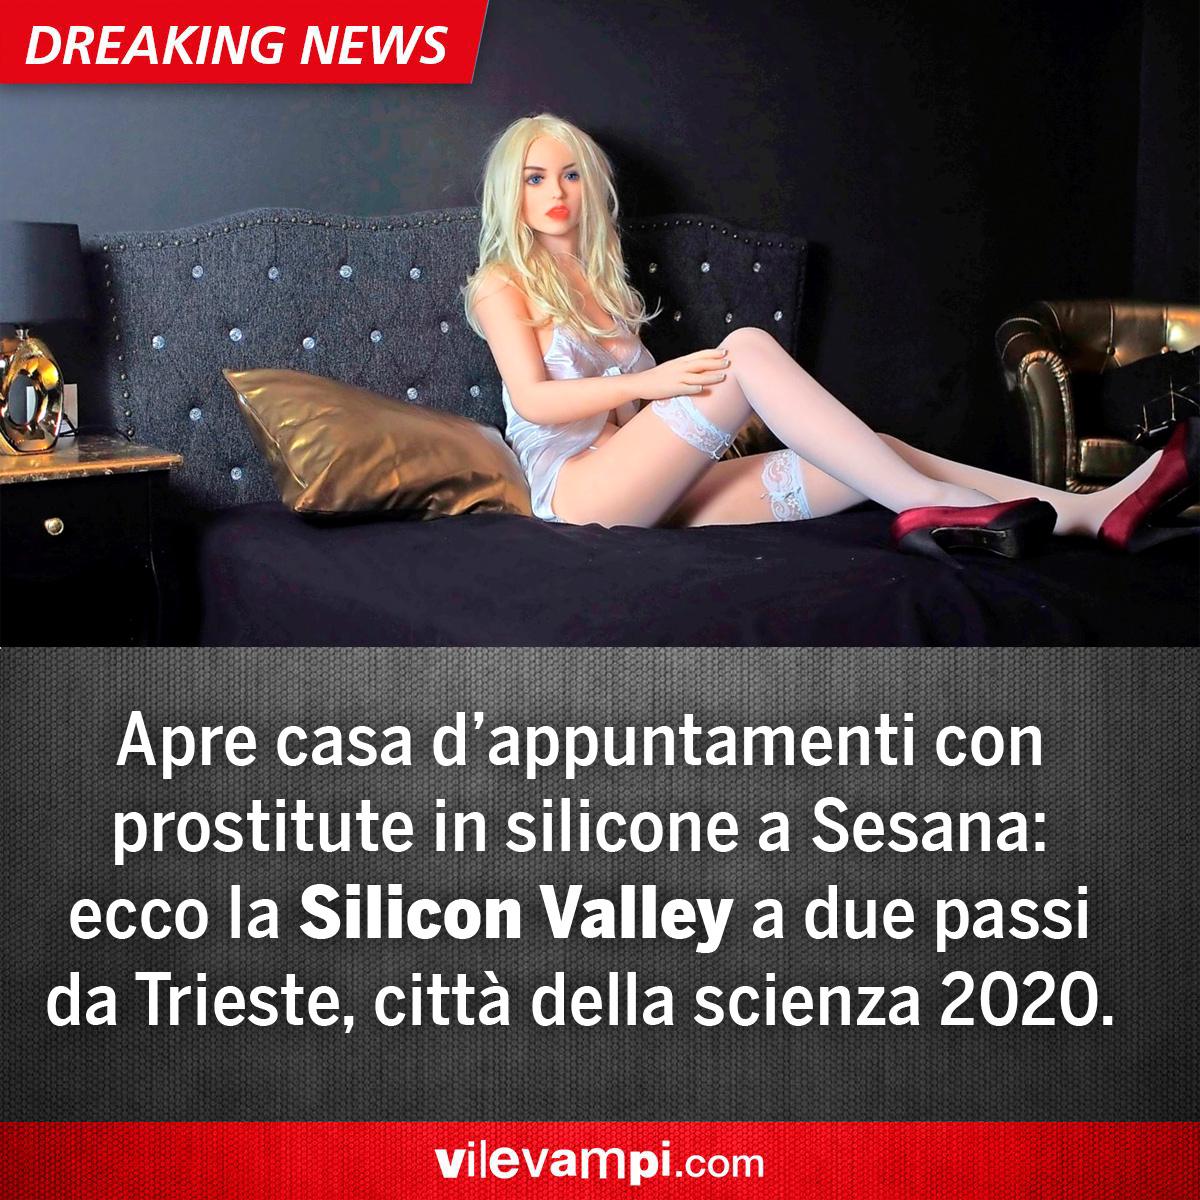 2020_Drek_news_Silicon-Valley